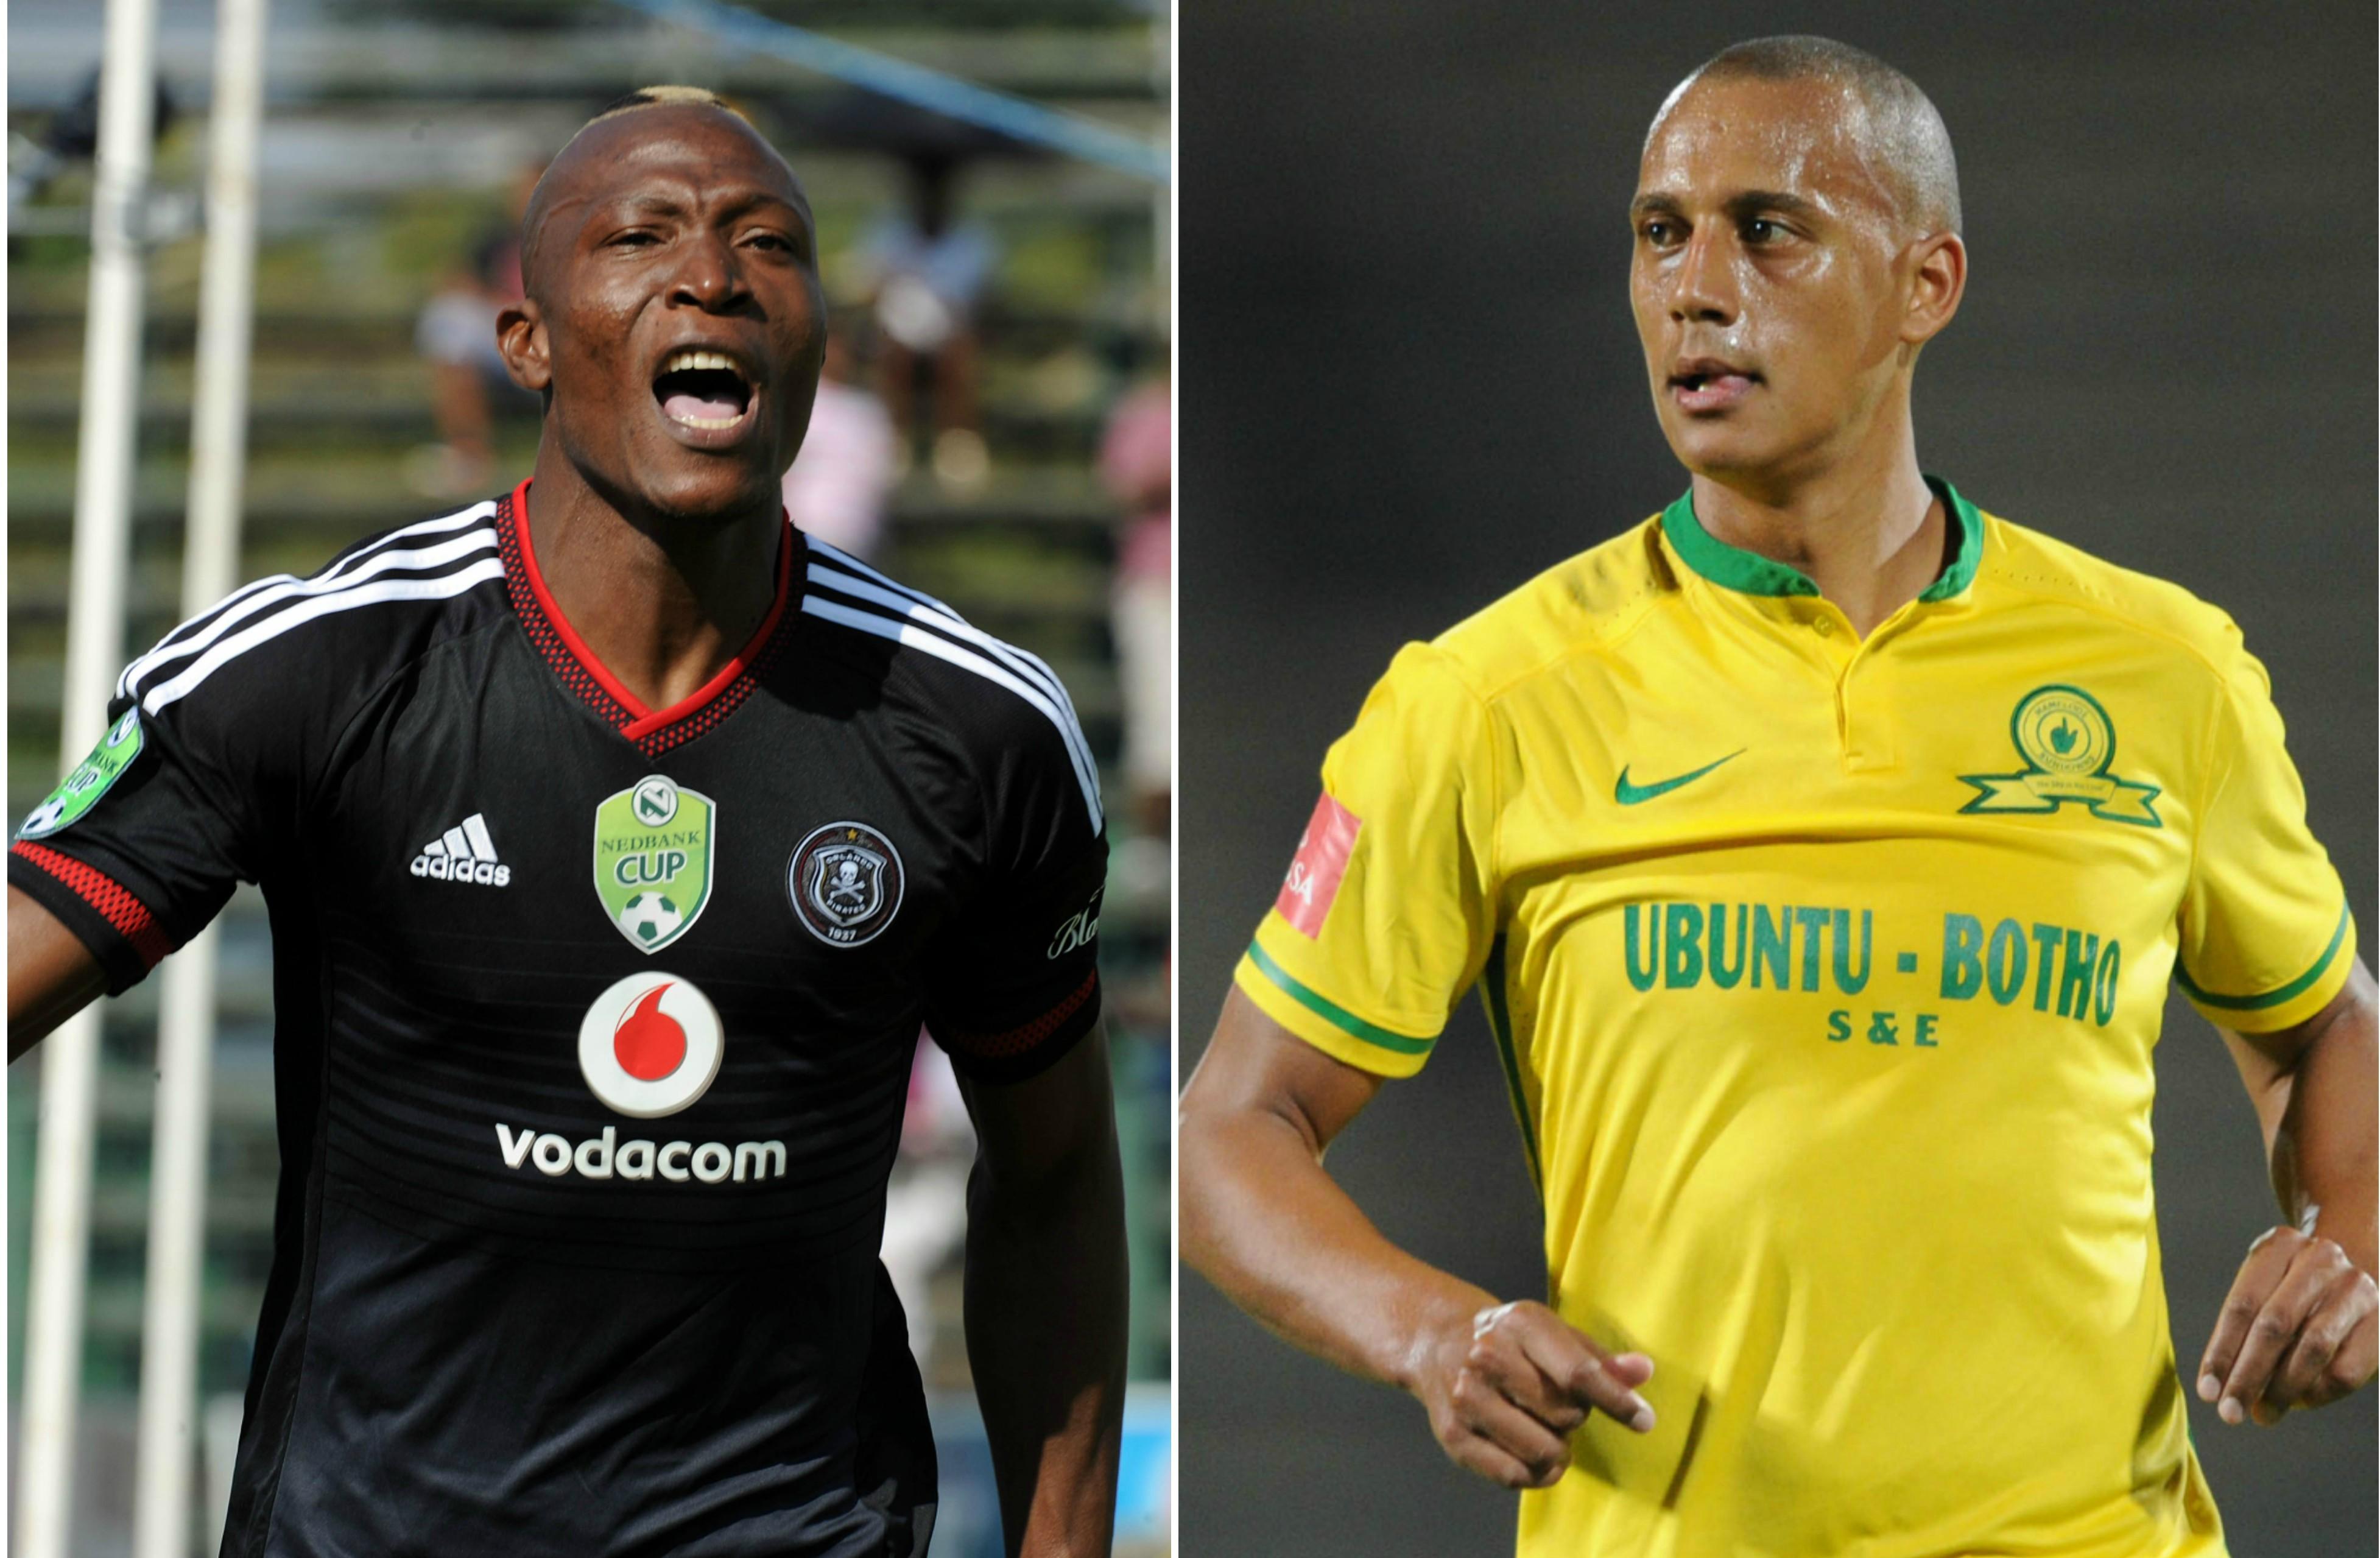 Tendai Ndoro (L) of Orlando Pirates and Wayne Arendse (R) of Mamelodi Sundowns.